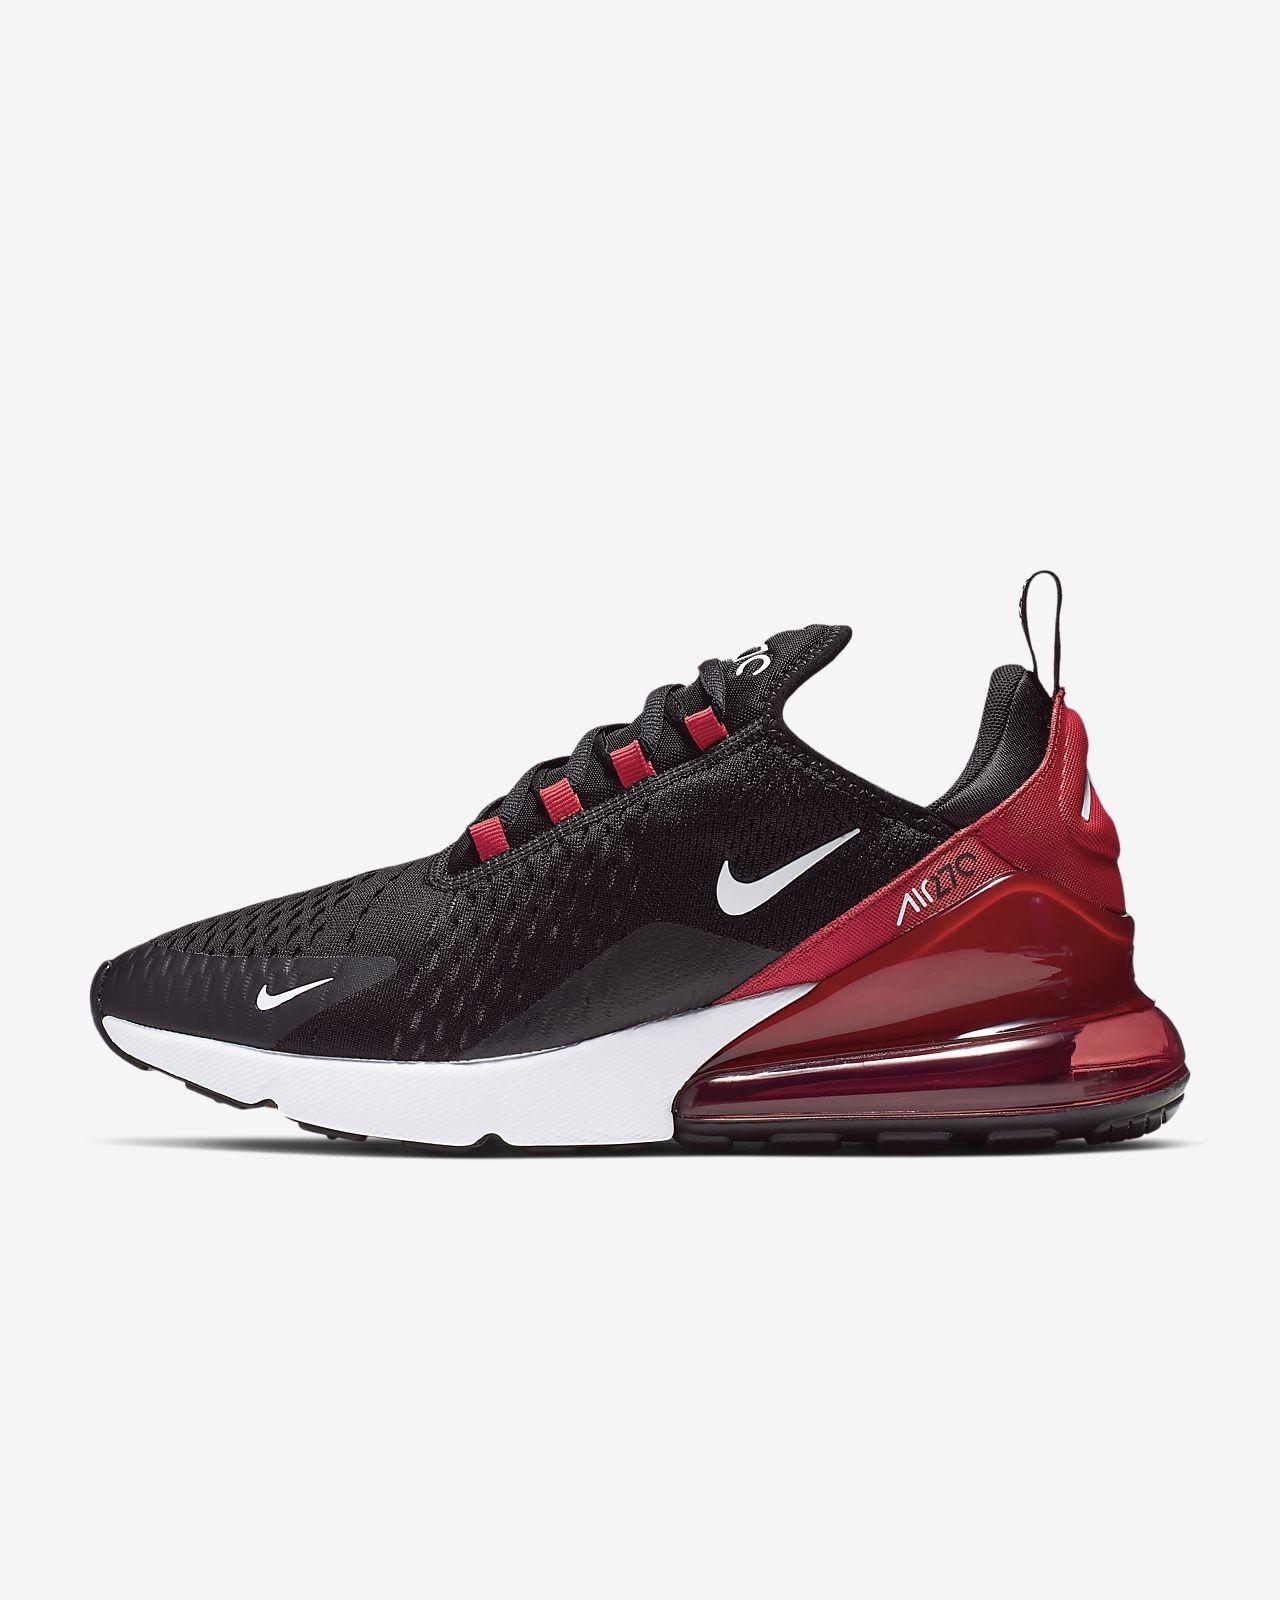 be666172a82 Sapatilhas Nike Air Max 270 para homem. Nike.com PT